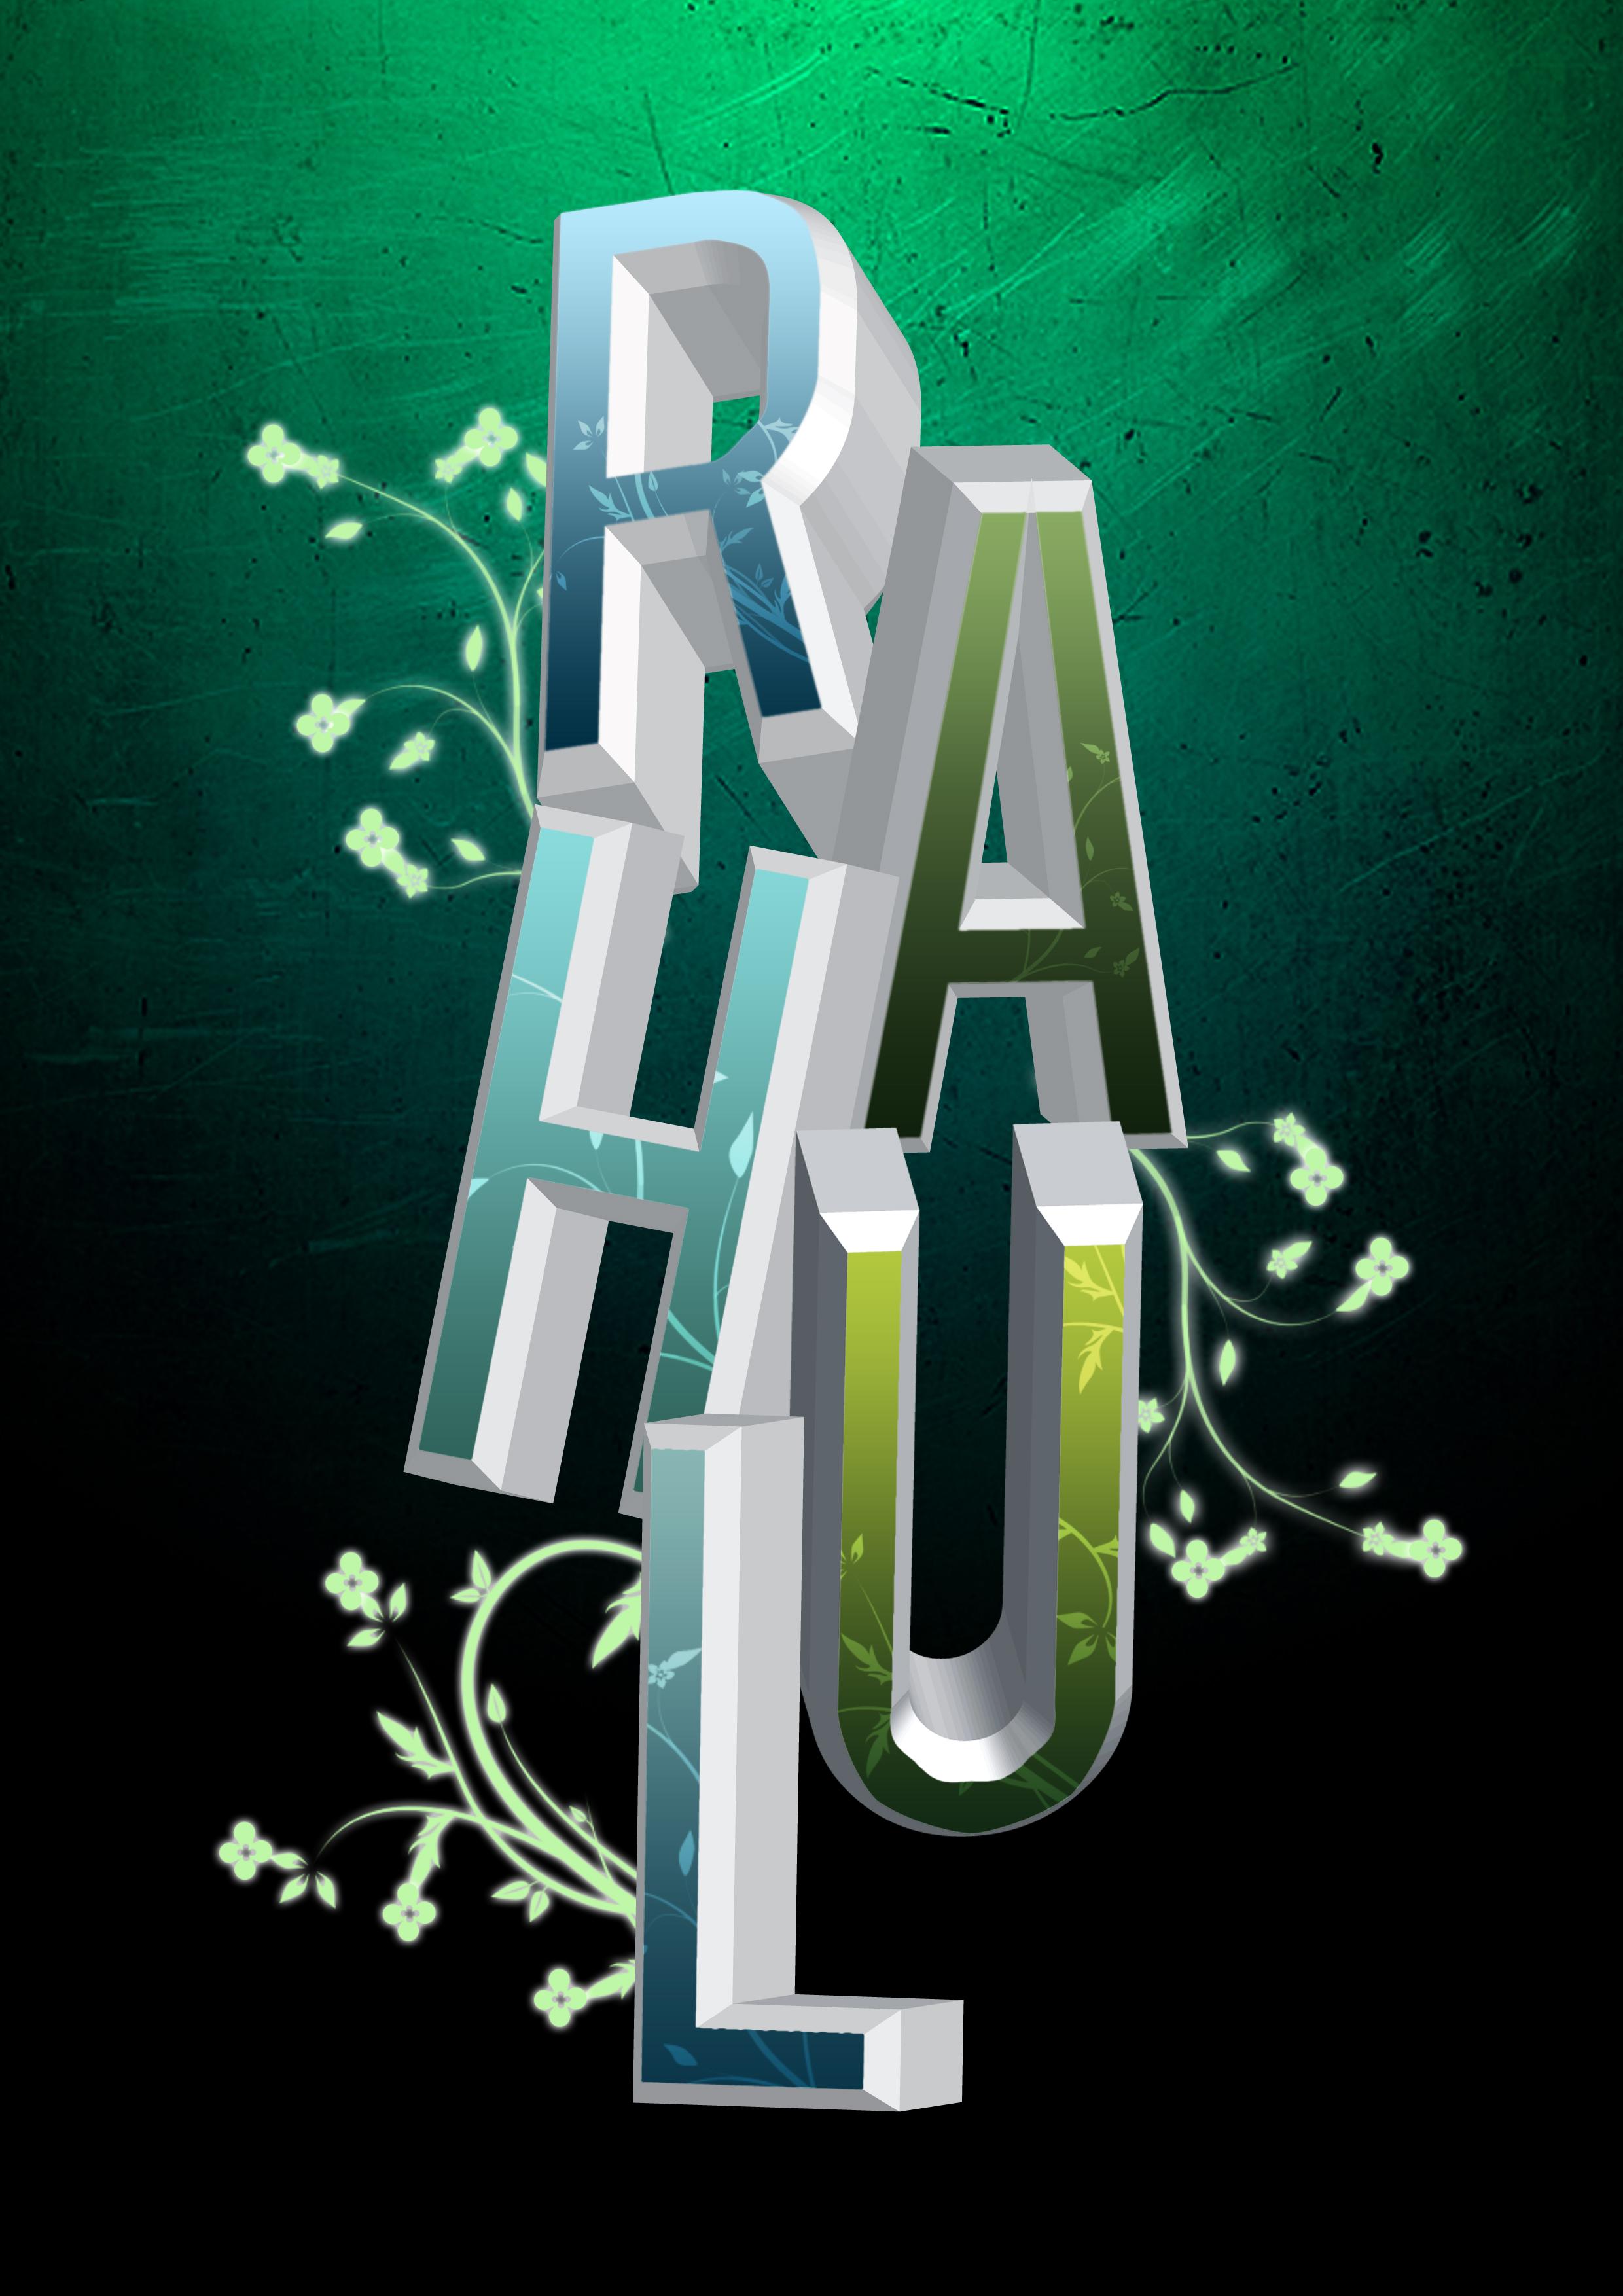 rahul logo wallpaper wwwpixsharkcom images galleries